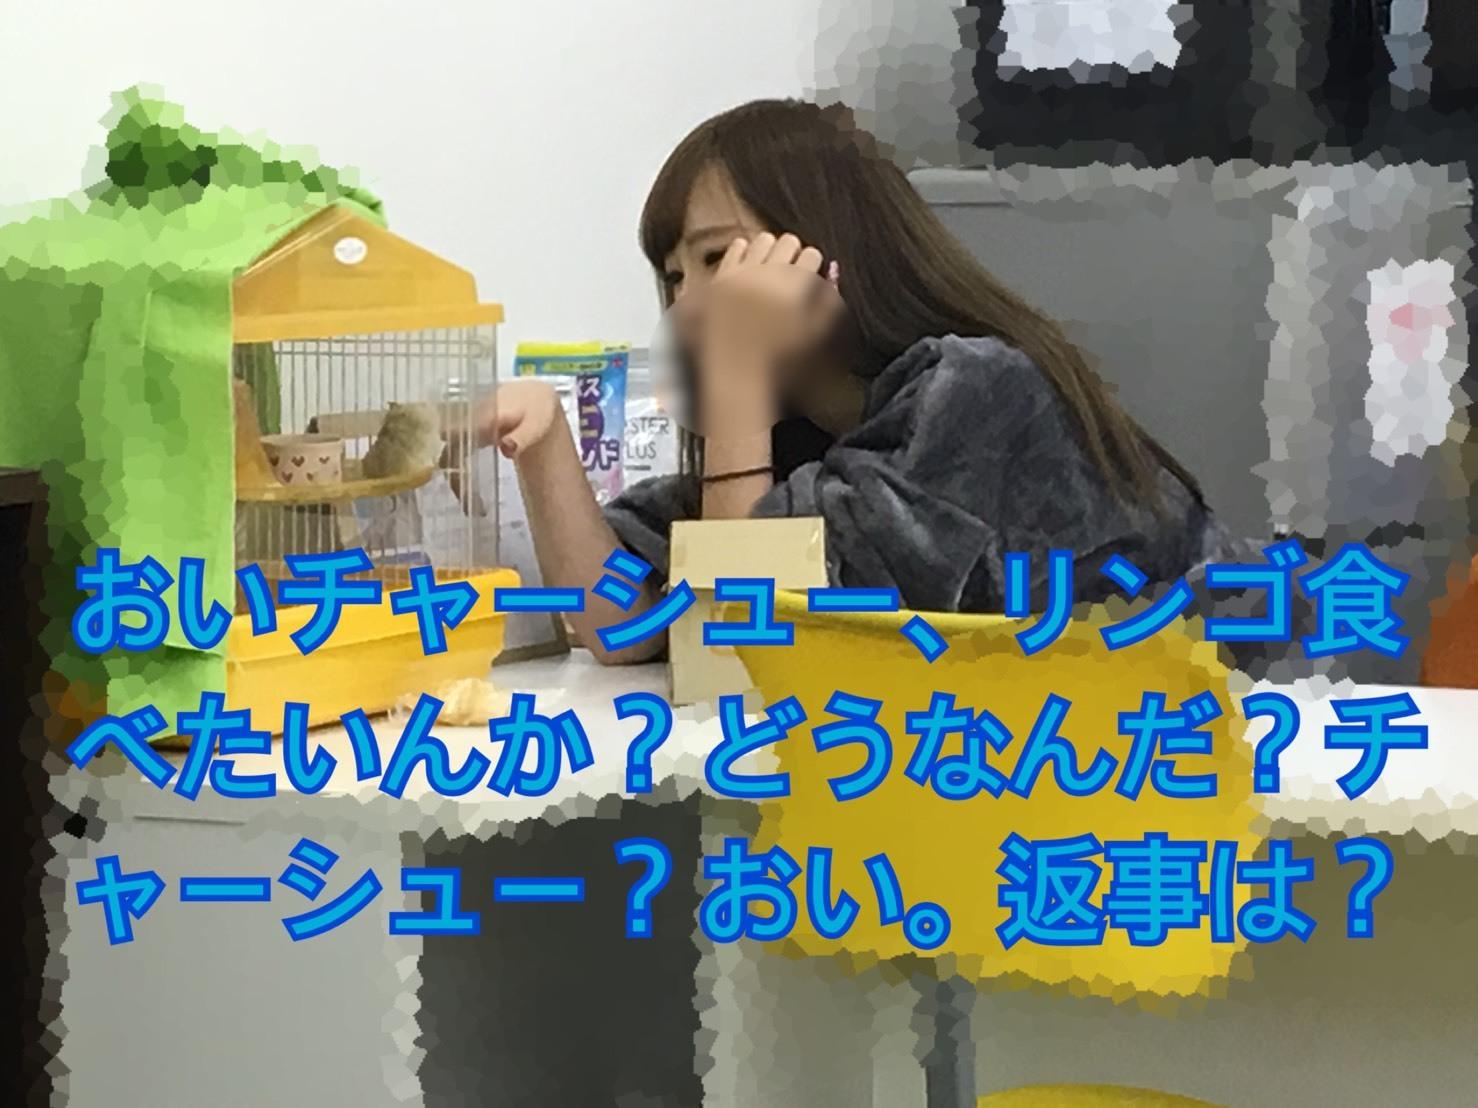 S__35741706.jpg